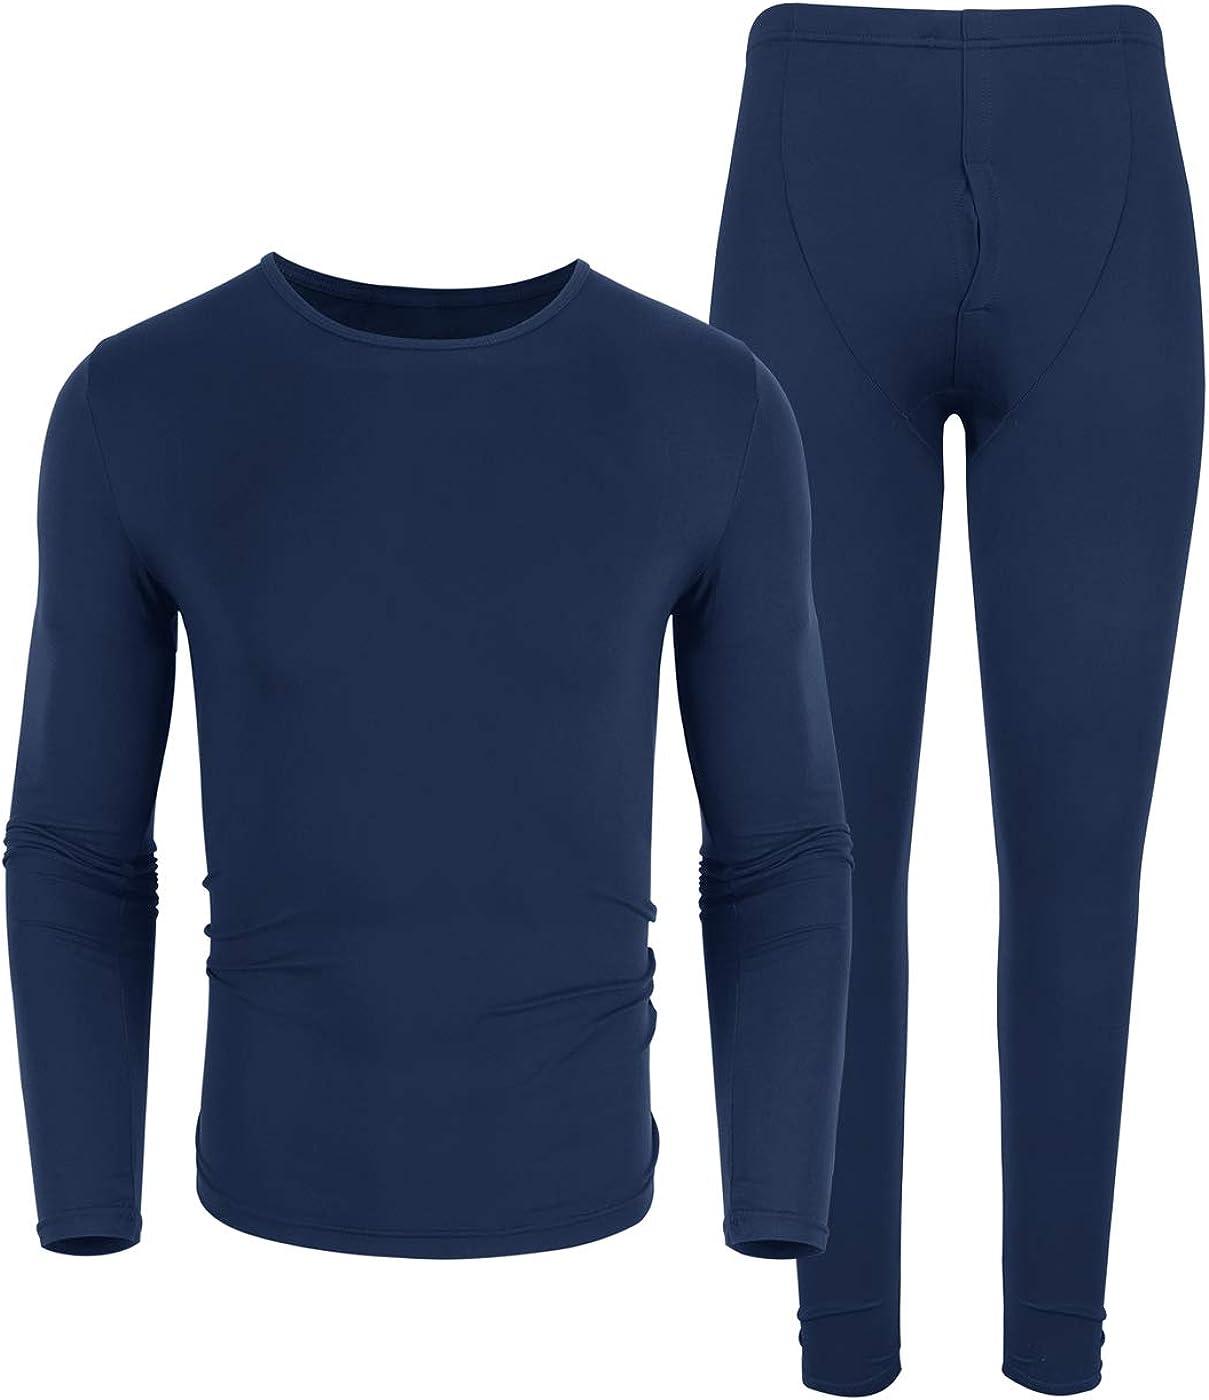 poriff Men's Thermal Underwear Ultra Soft Lightweight Thin Long John Set